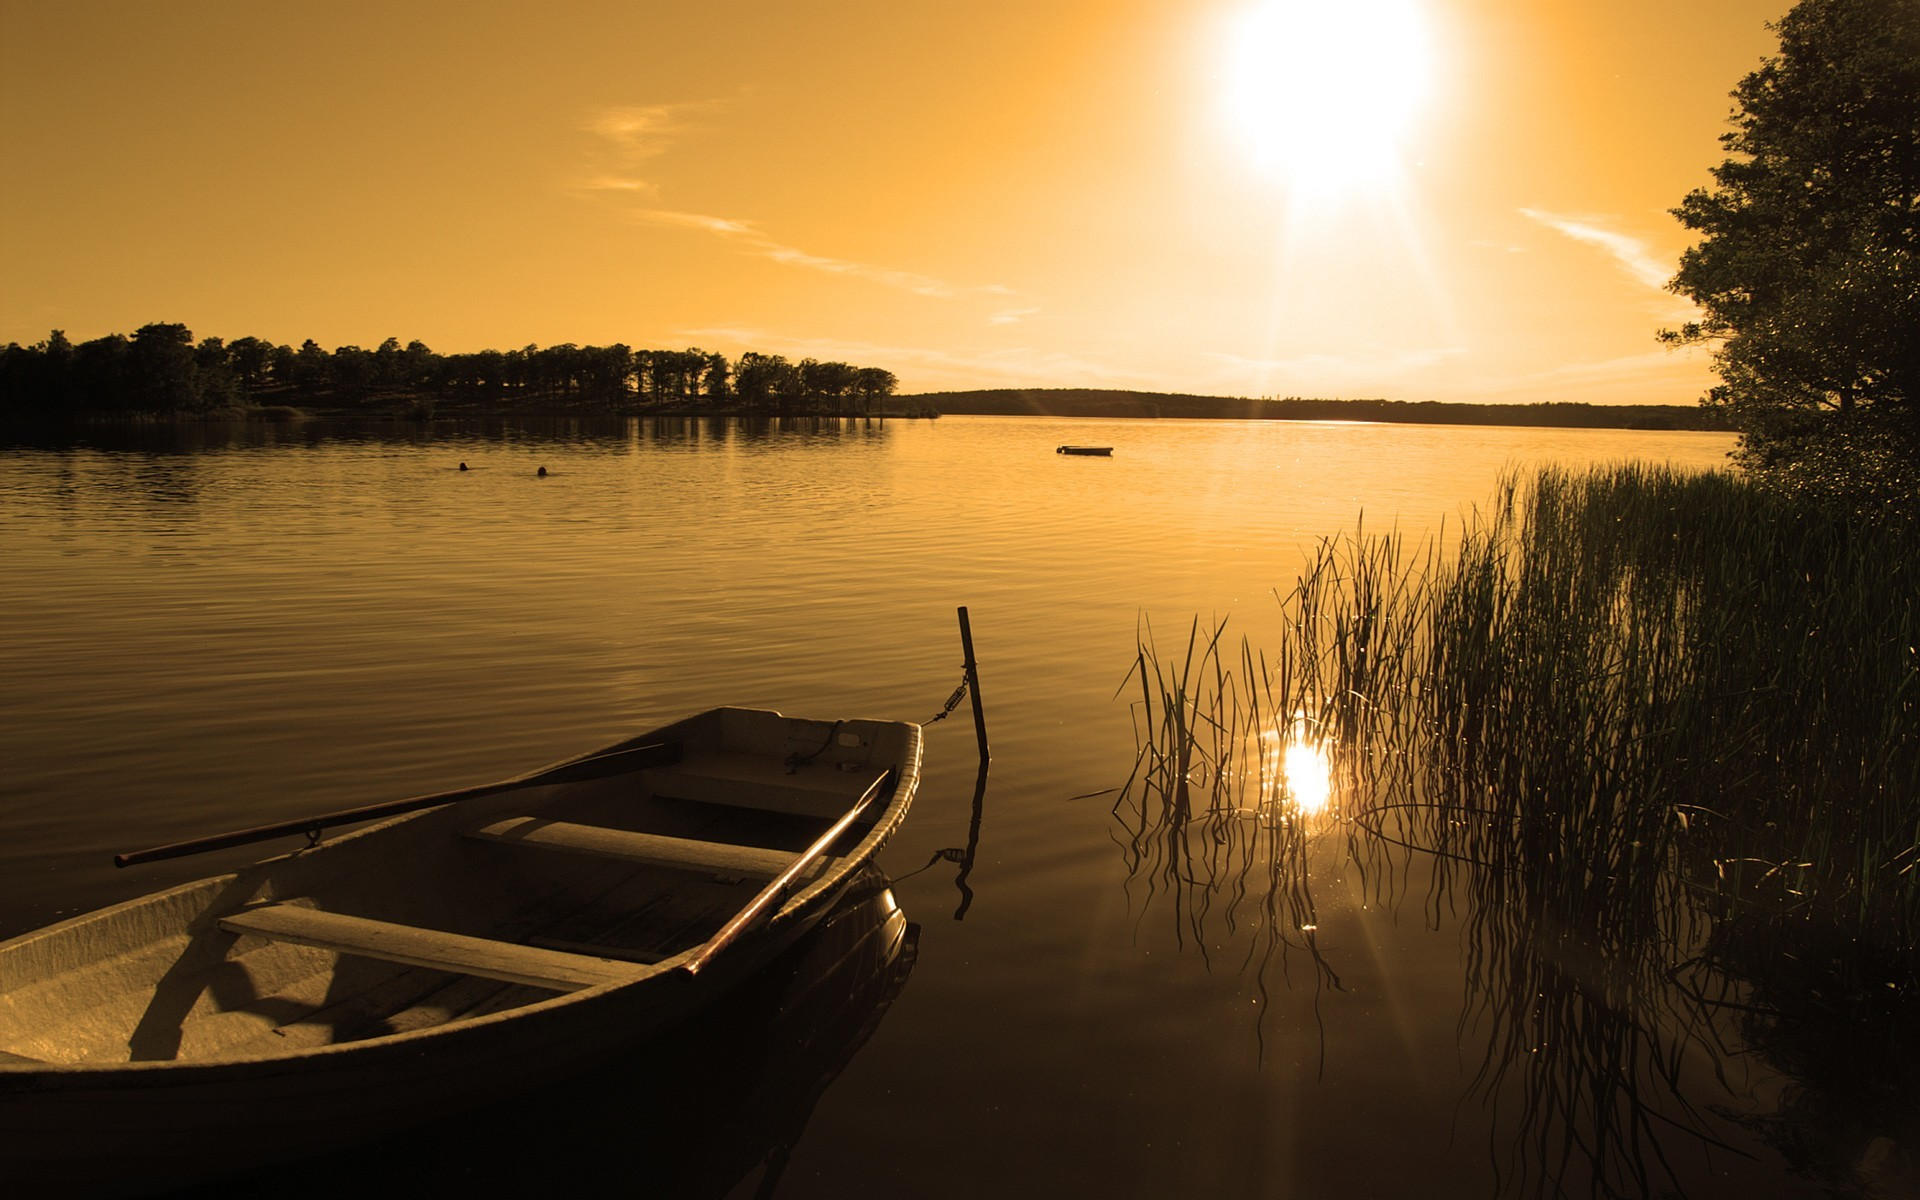 Пустая лодка